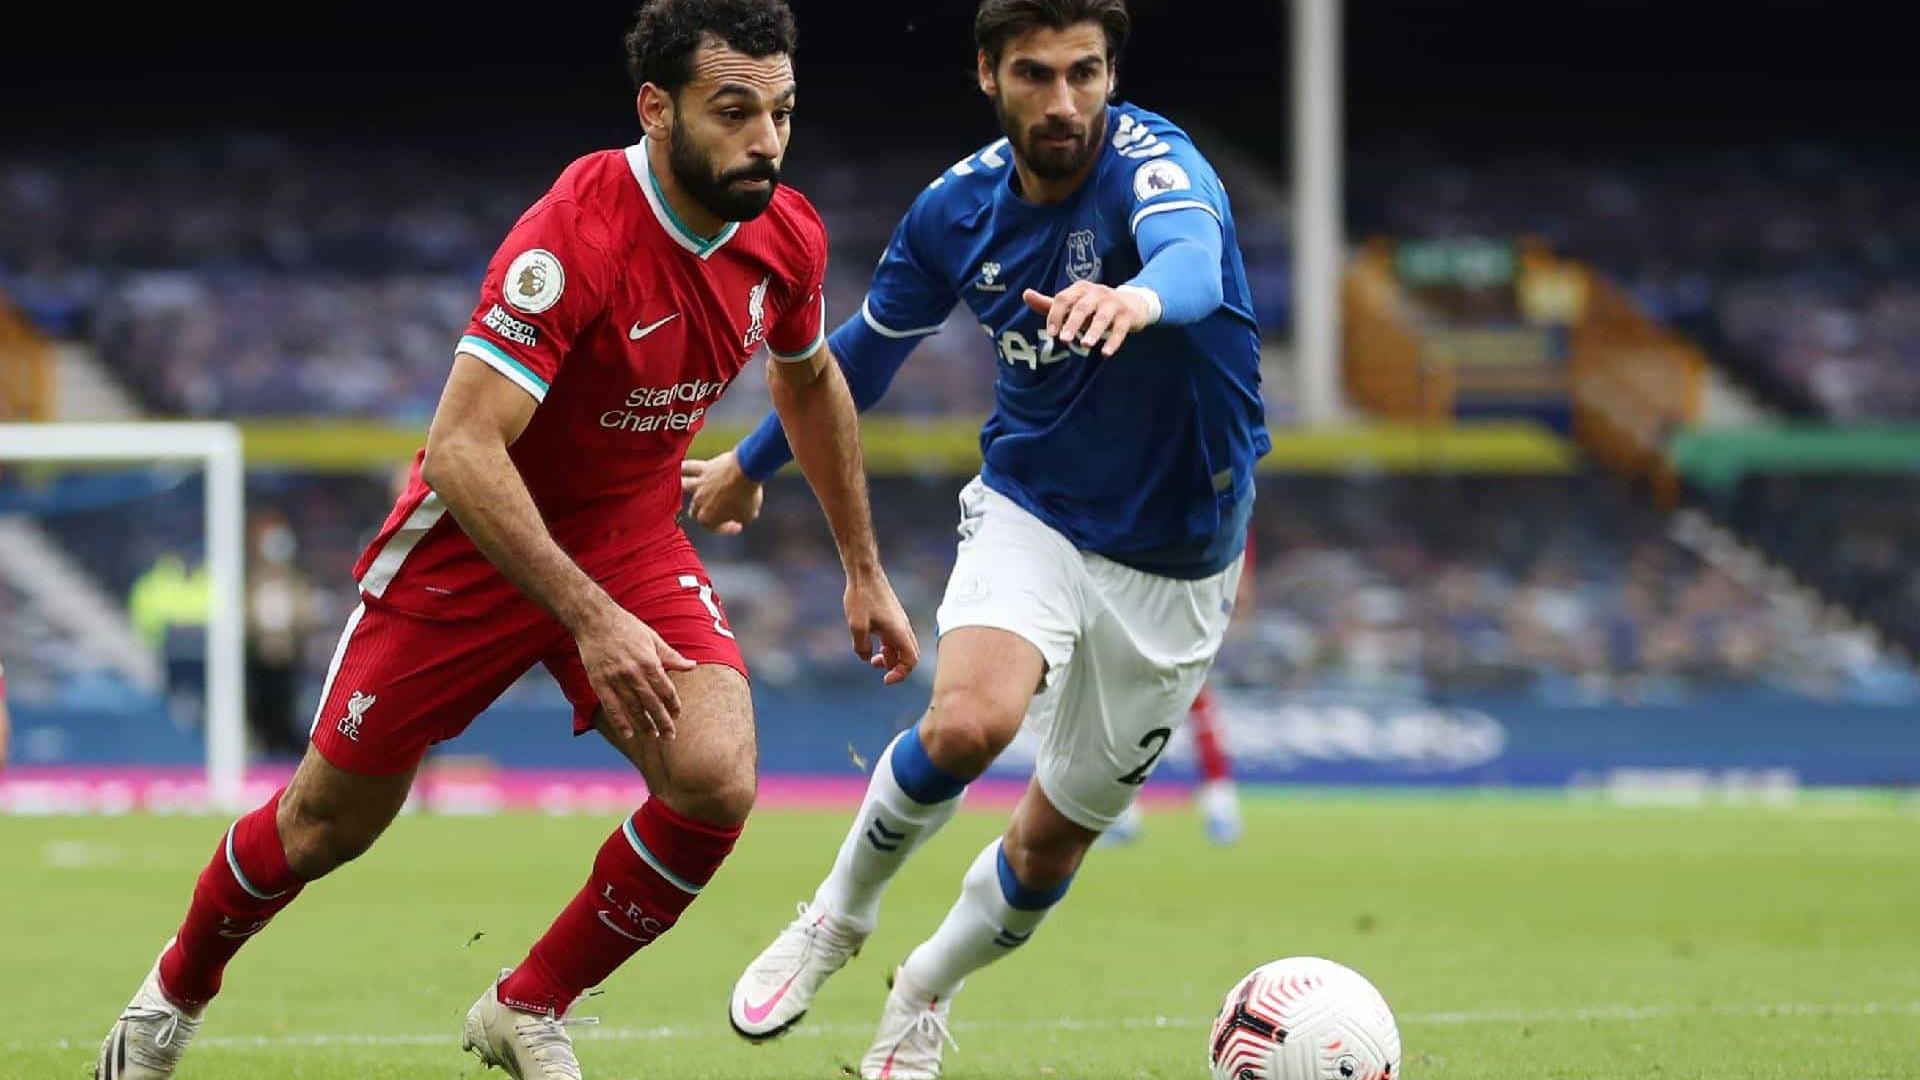 Salah marca 100º gol, Richarlison é expulso e Everton e Liverpool empatam